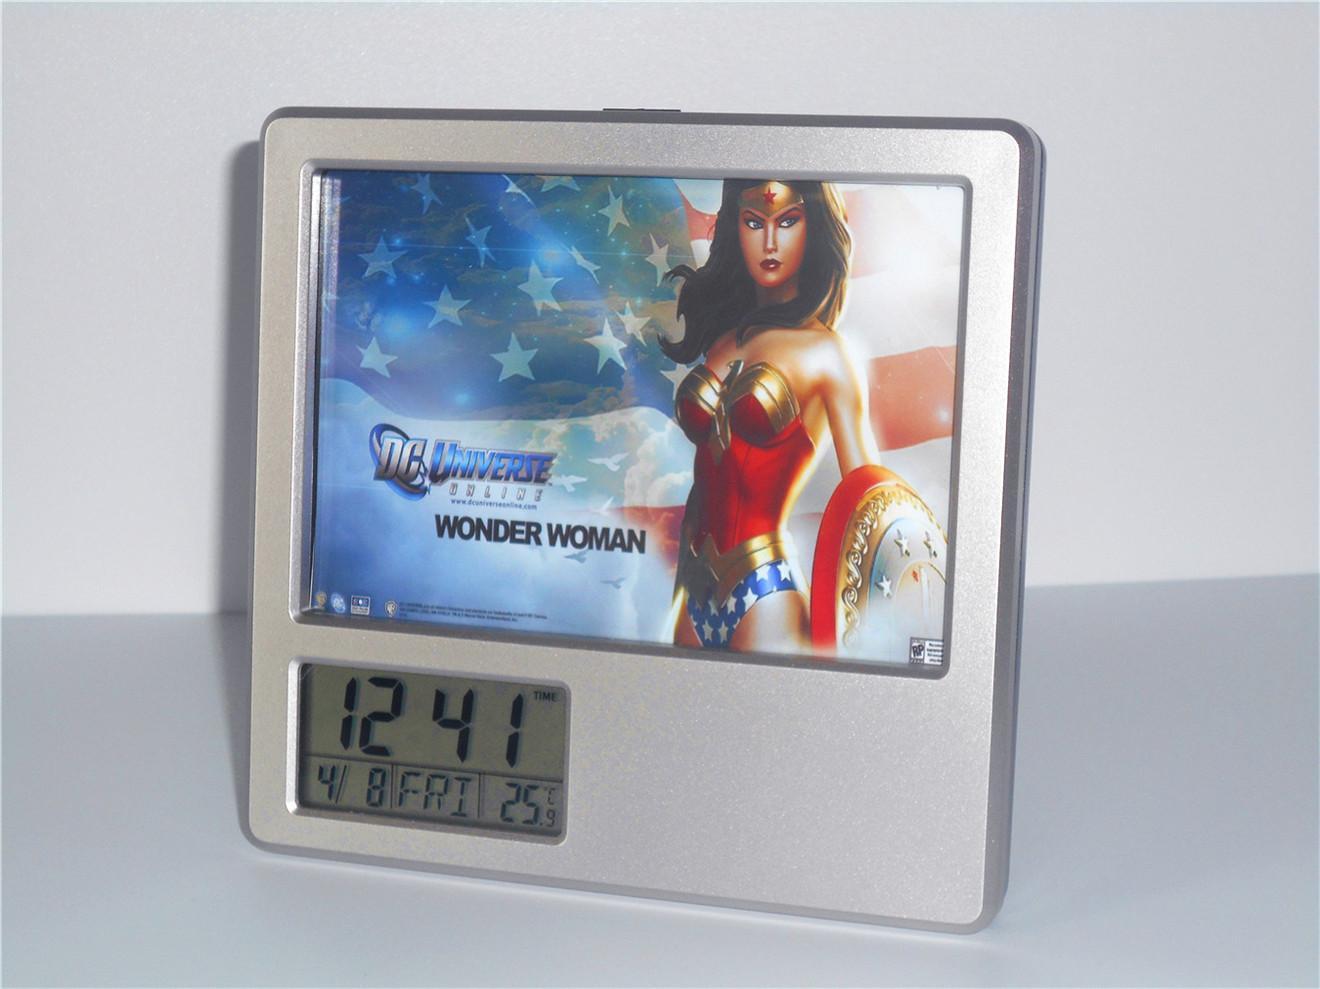 Creative Digital Calendar 2017 new wonder woman creative digital alarm clock multi function